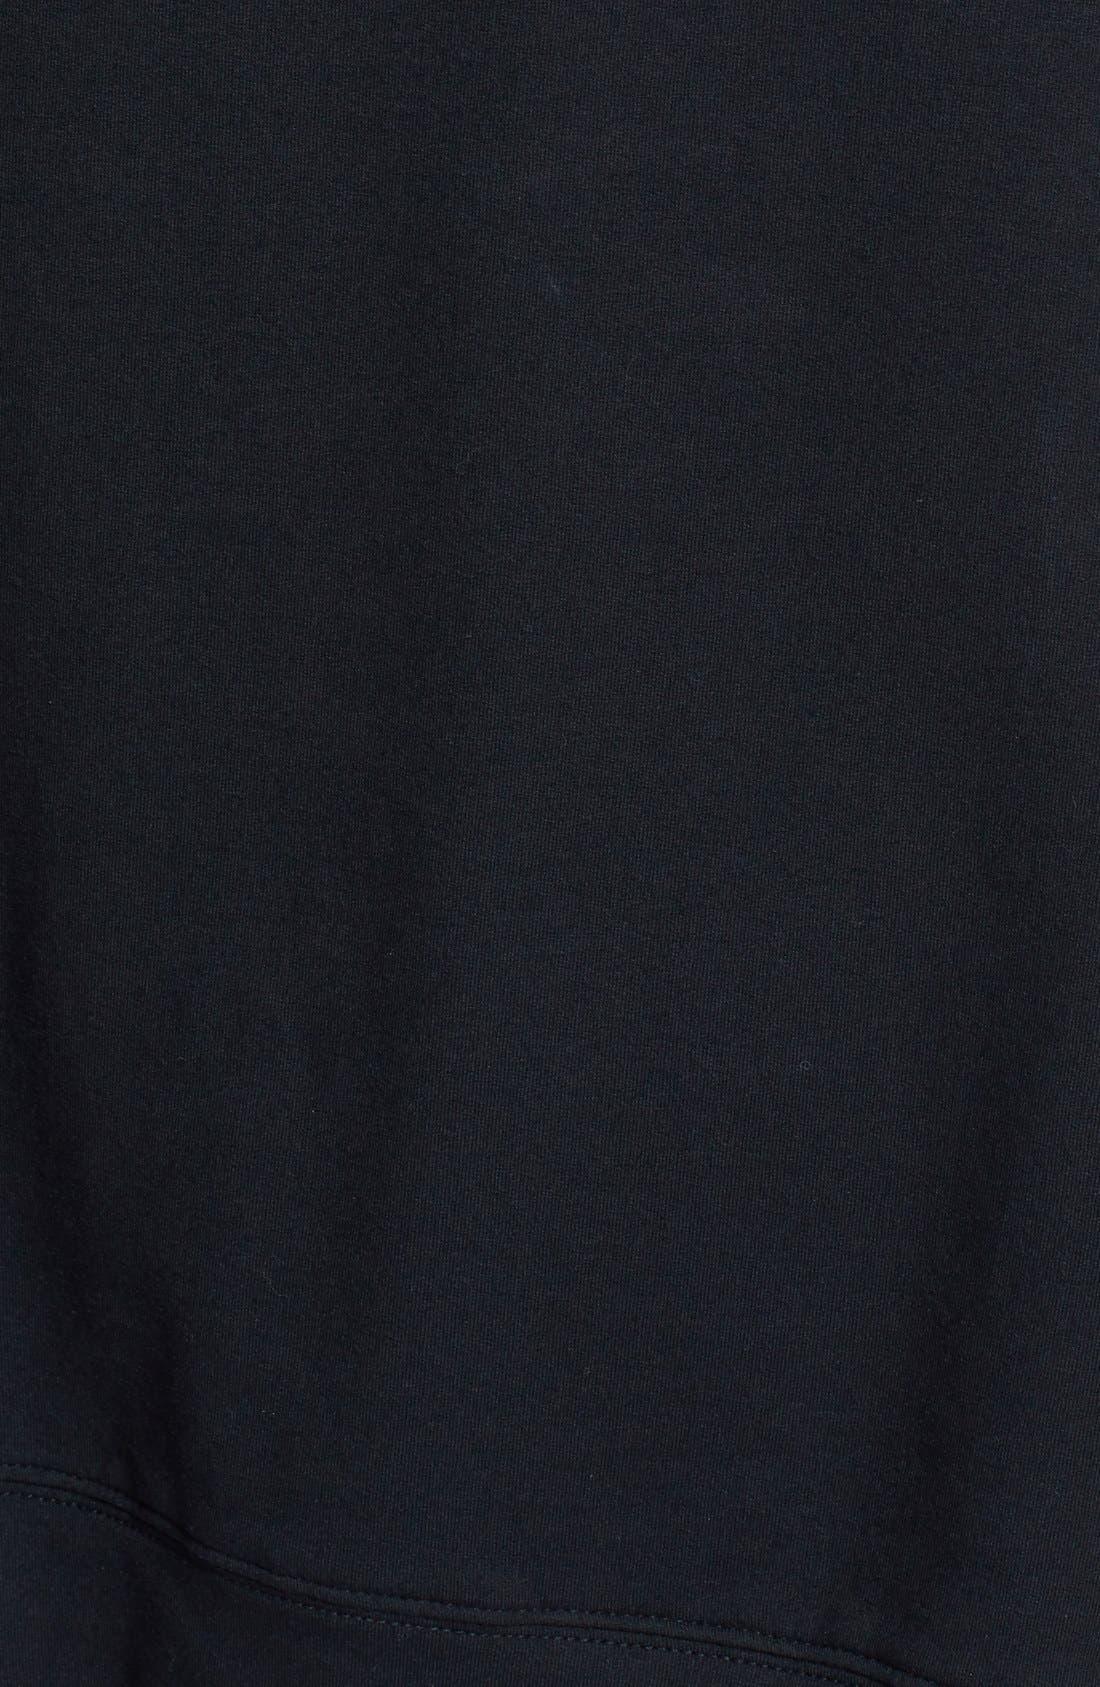 Alternate Image 3  - Halogen® Leather & Knit Mixed Media Top (Regular & Petite)